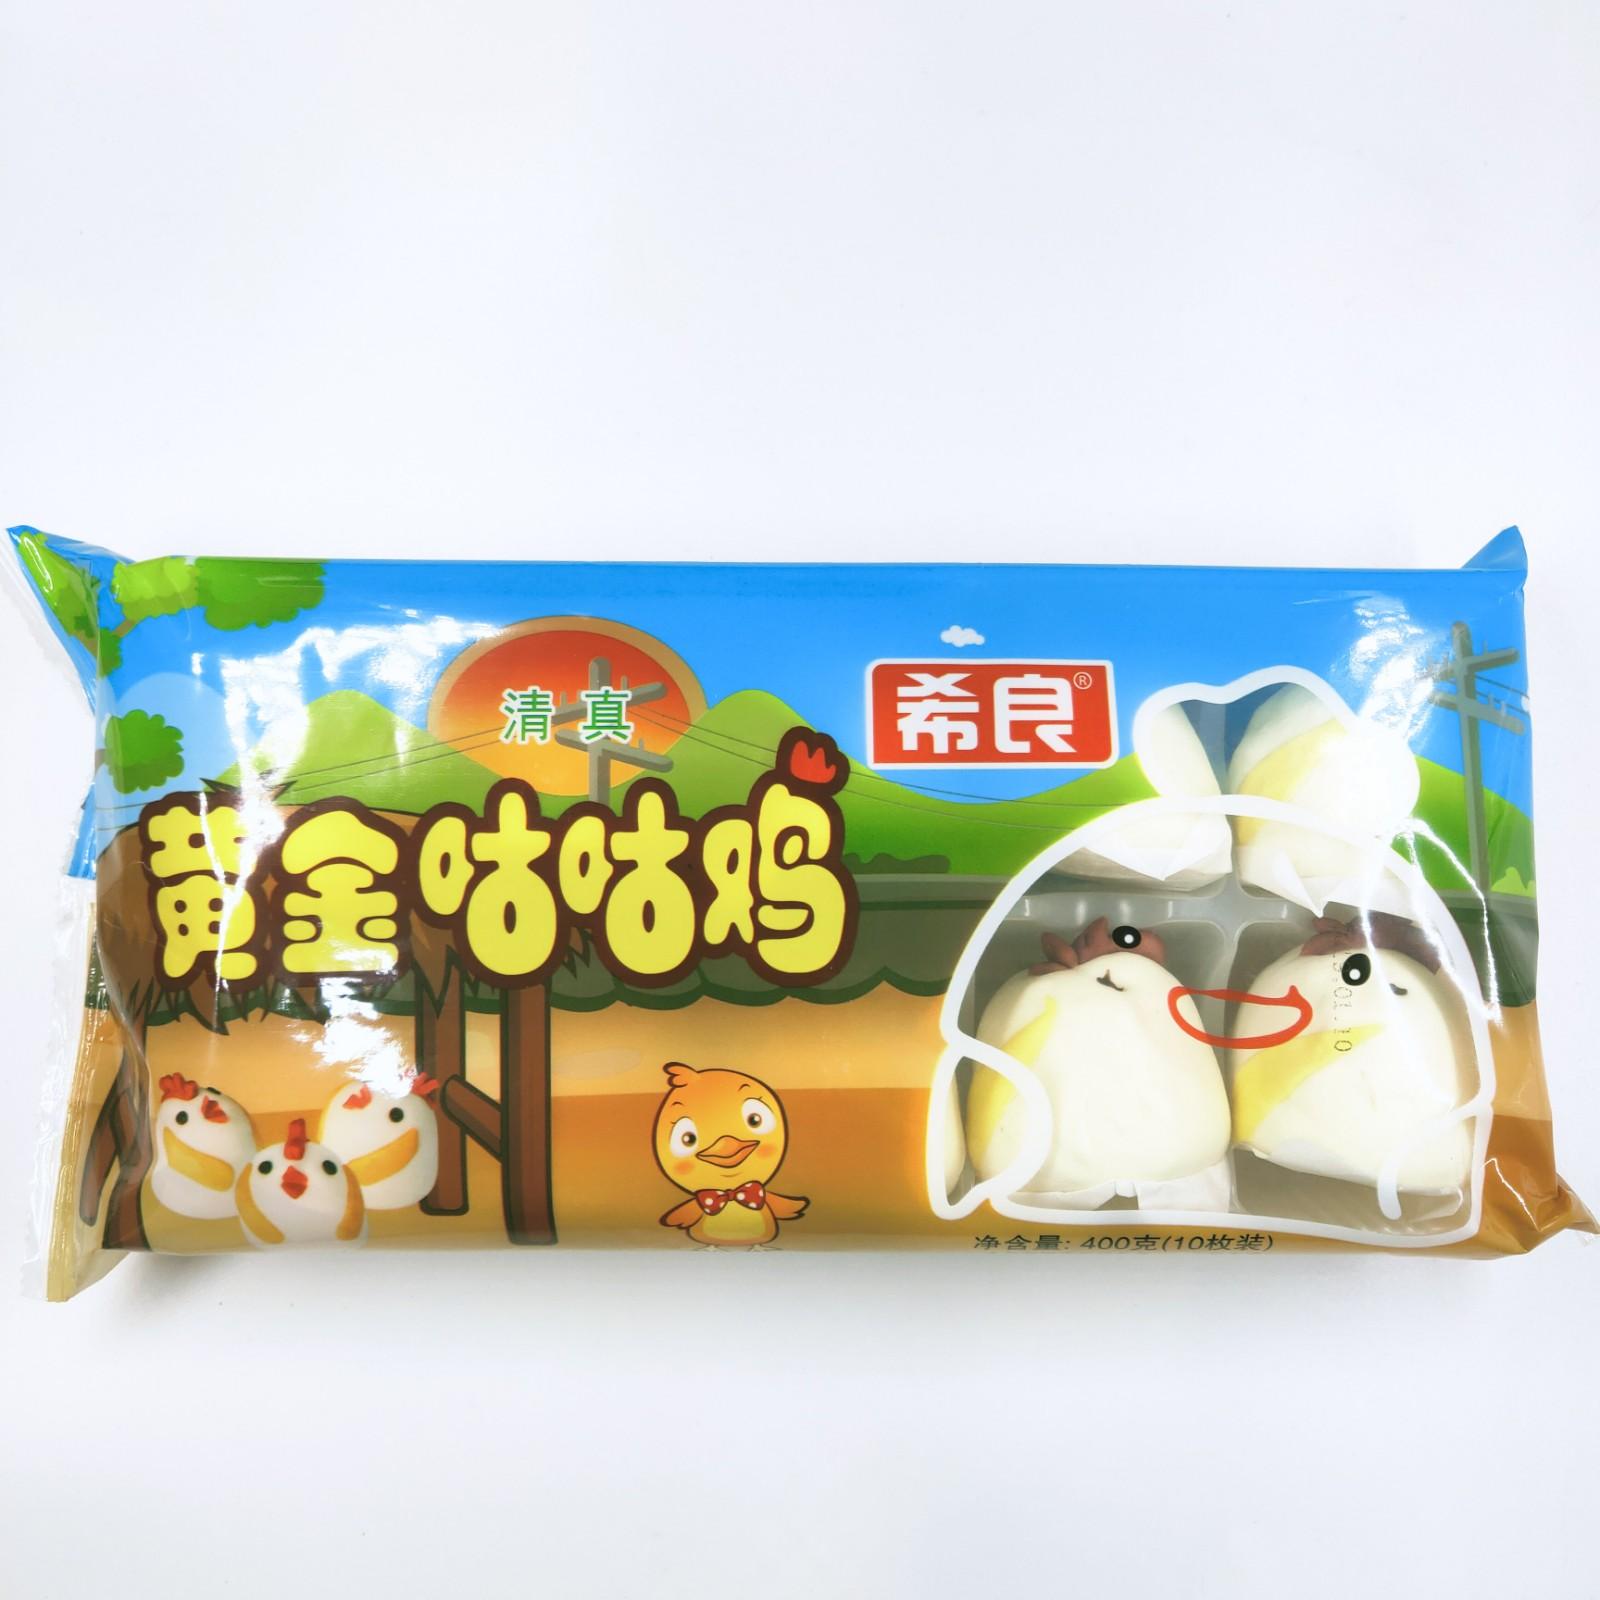 400g 10枚咕咕小鸡 红小豆动物卡通包子甜点心小吃酒店特色速冻